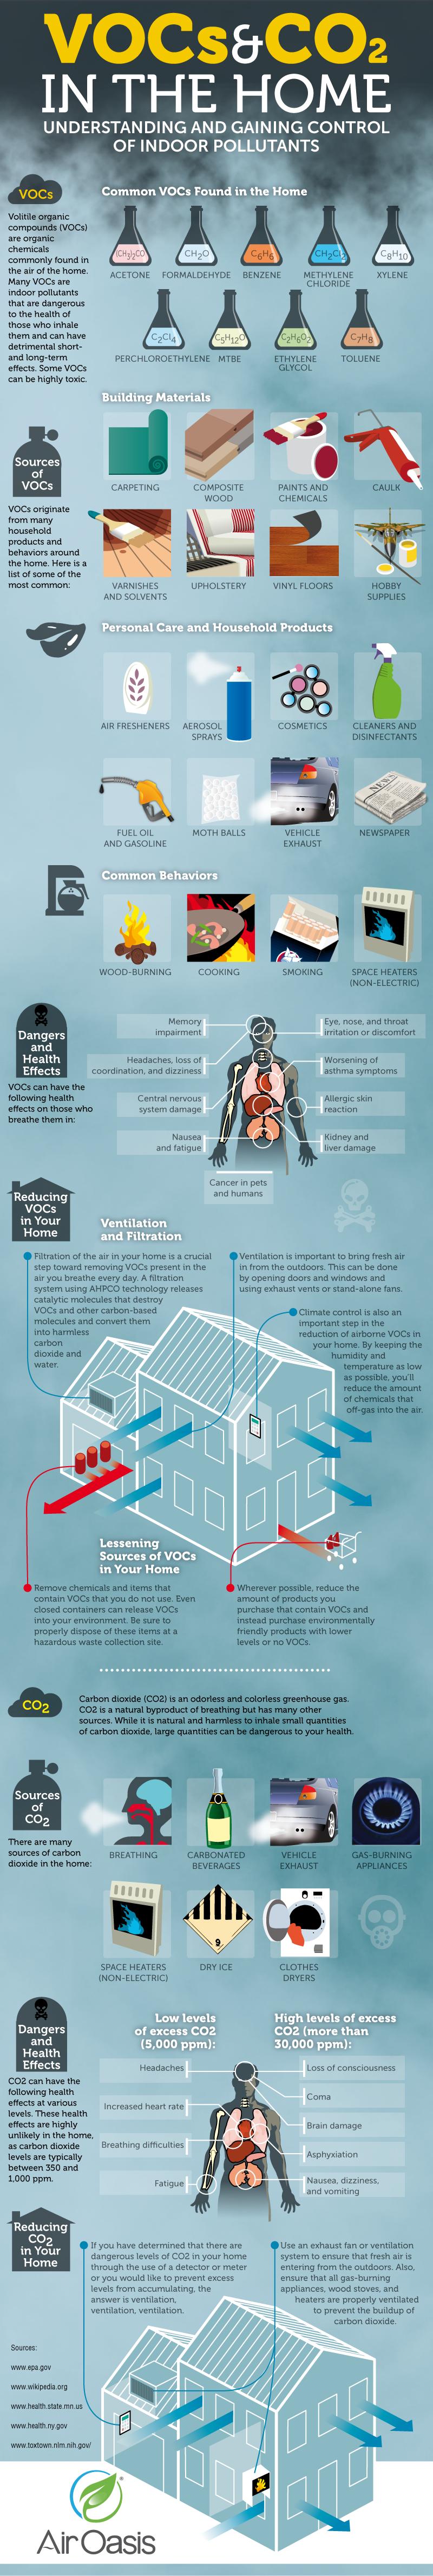 VOCs vs CO2